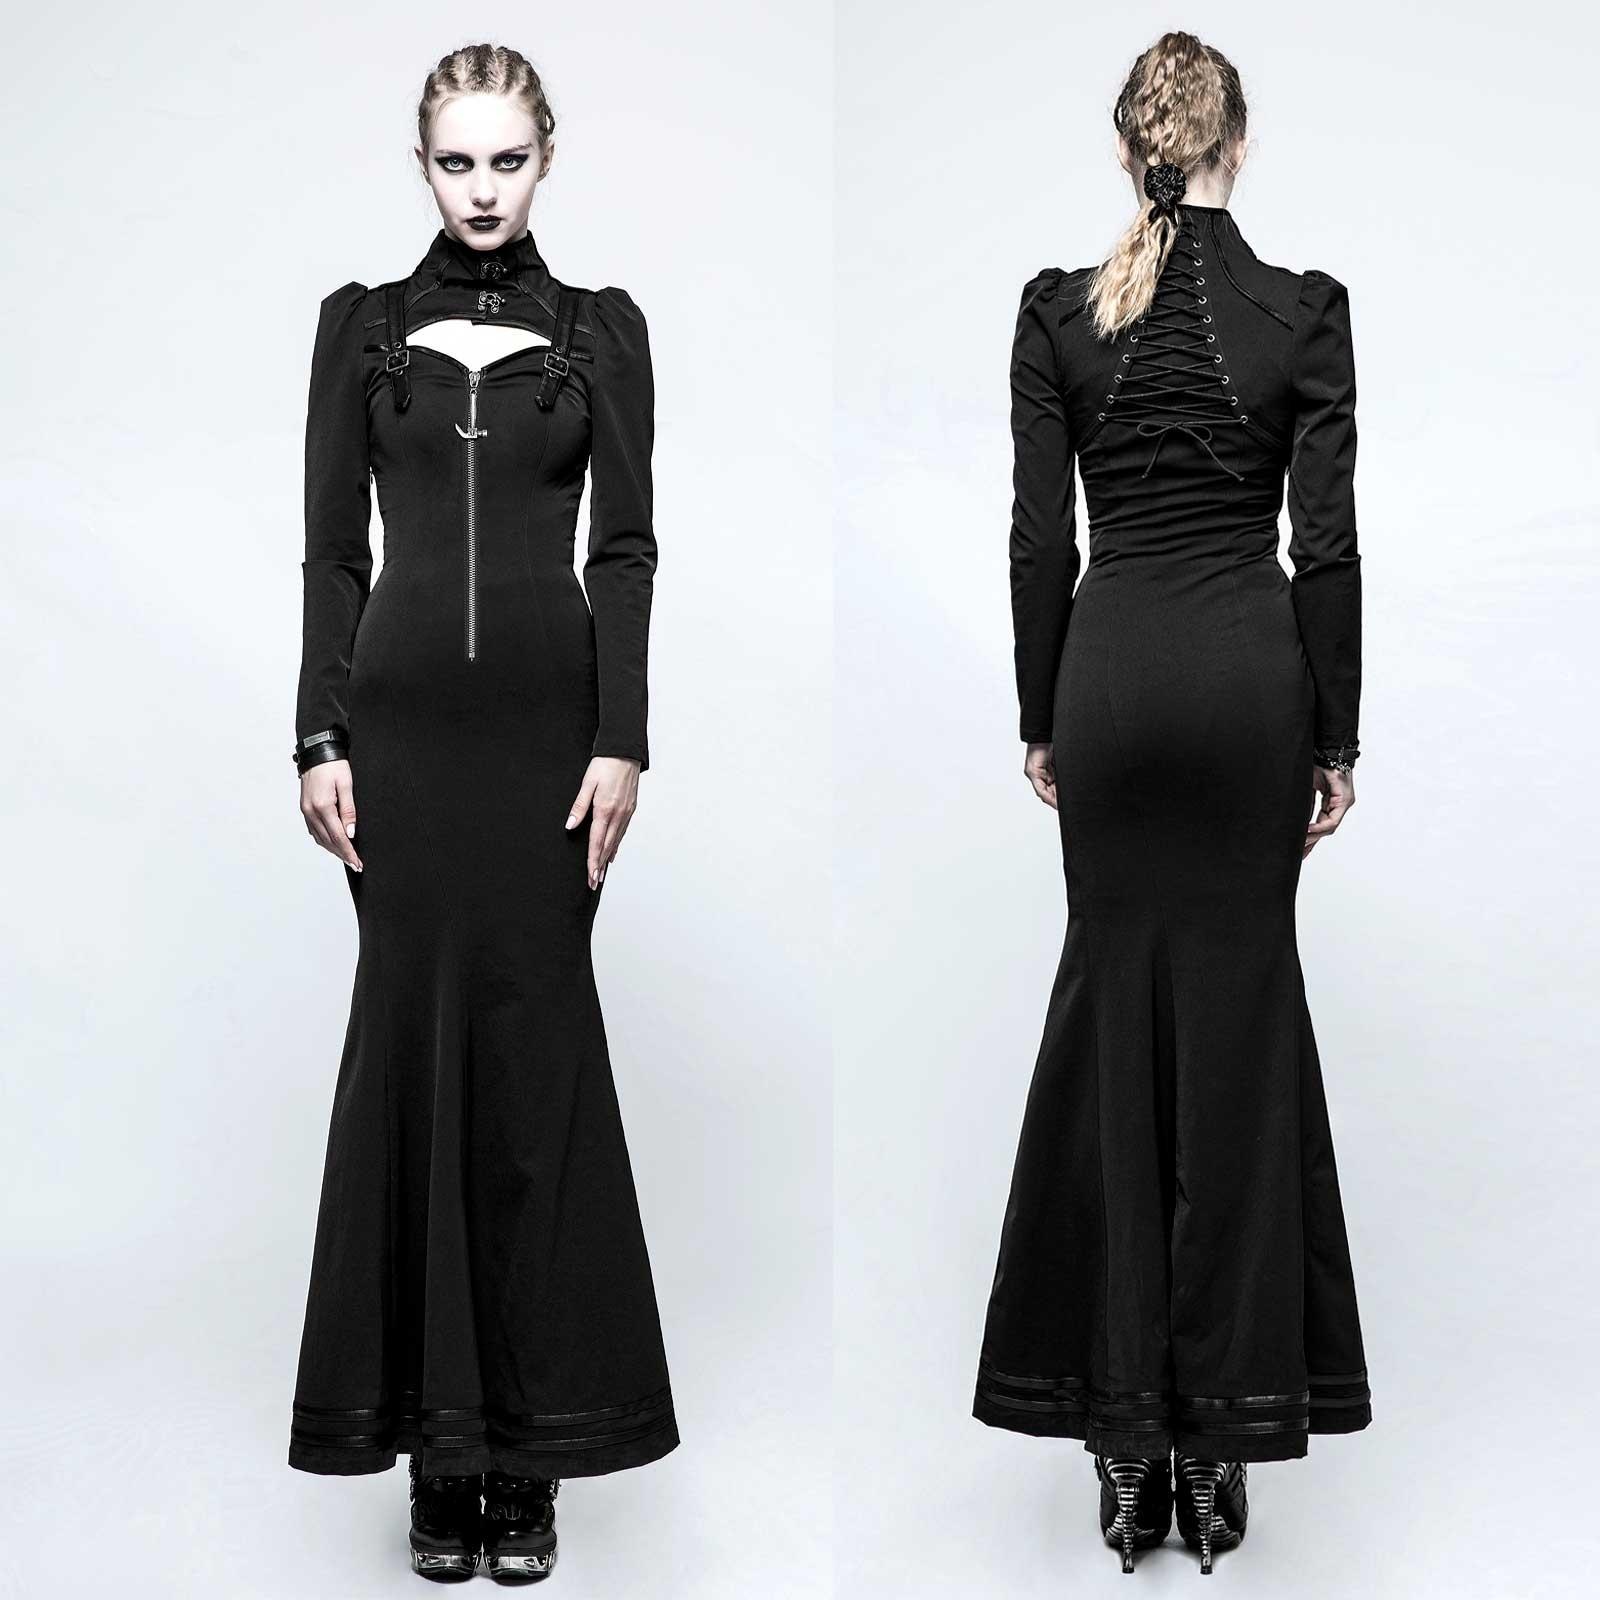 20 Fantastisch Kleid Lang Eng SpezialgebietDesigner Großartig Kleid Lang Eng Boutique